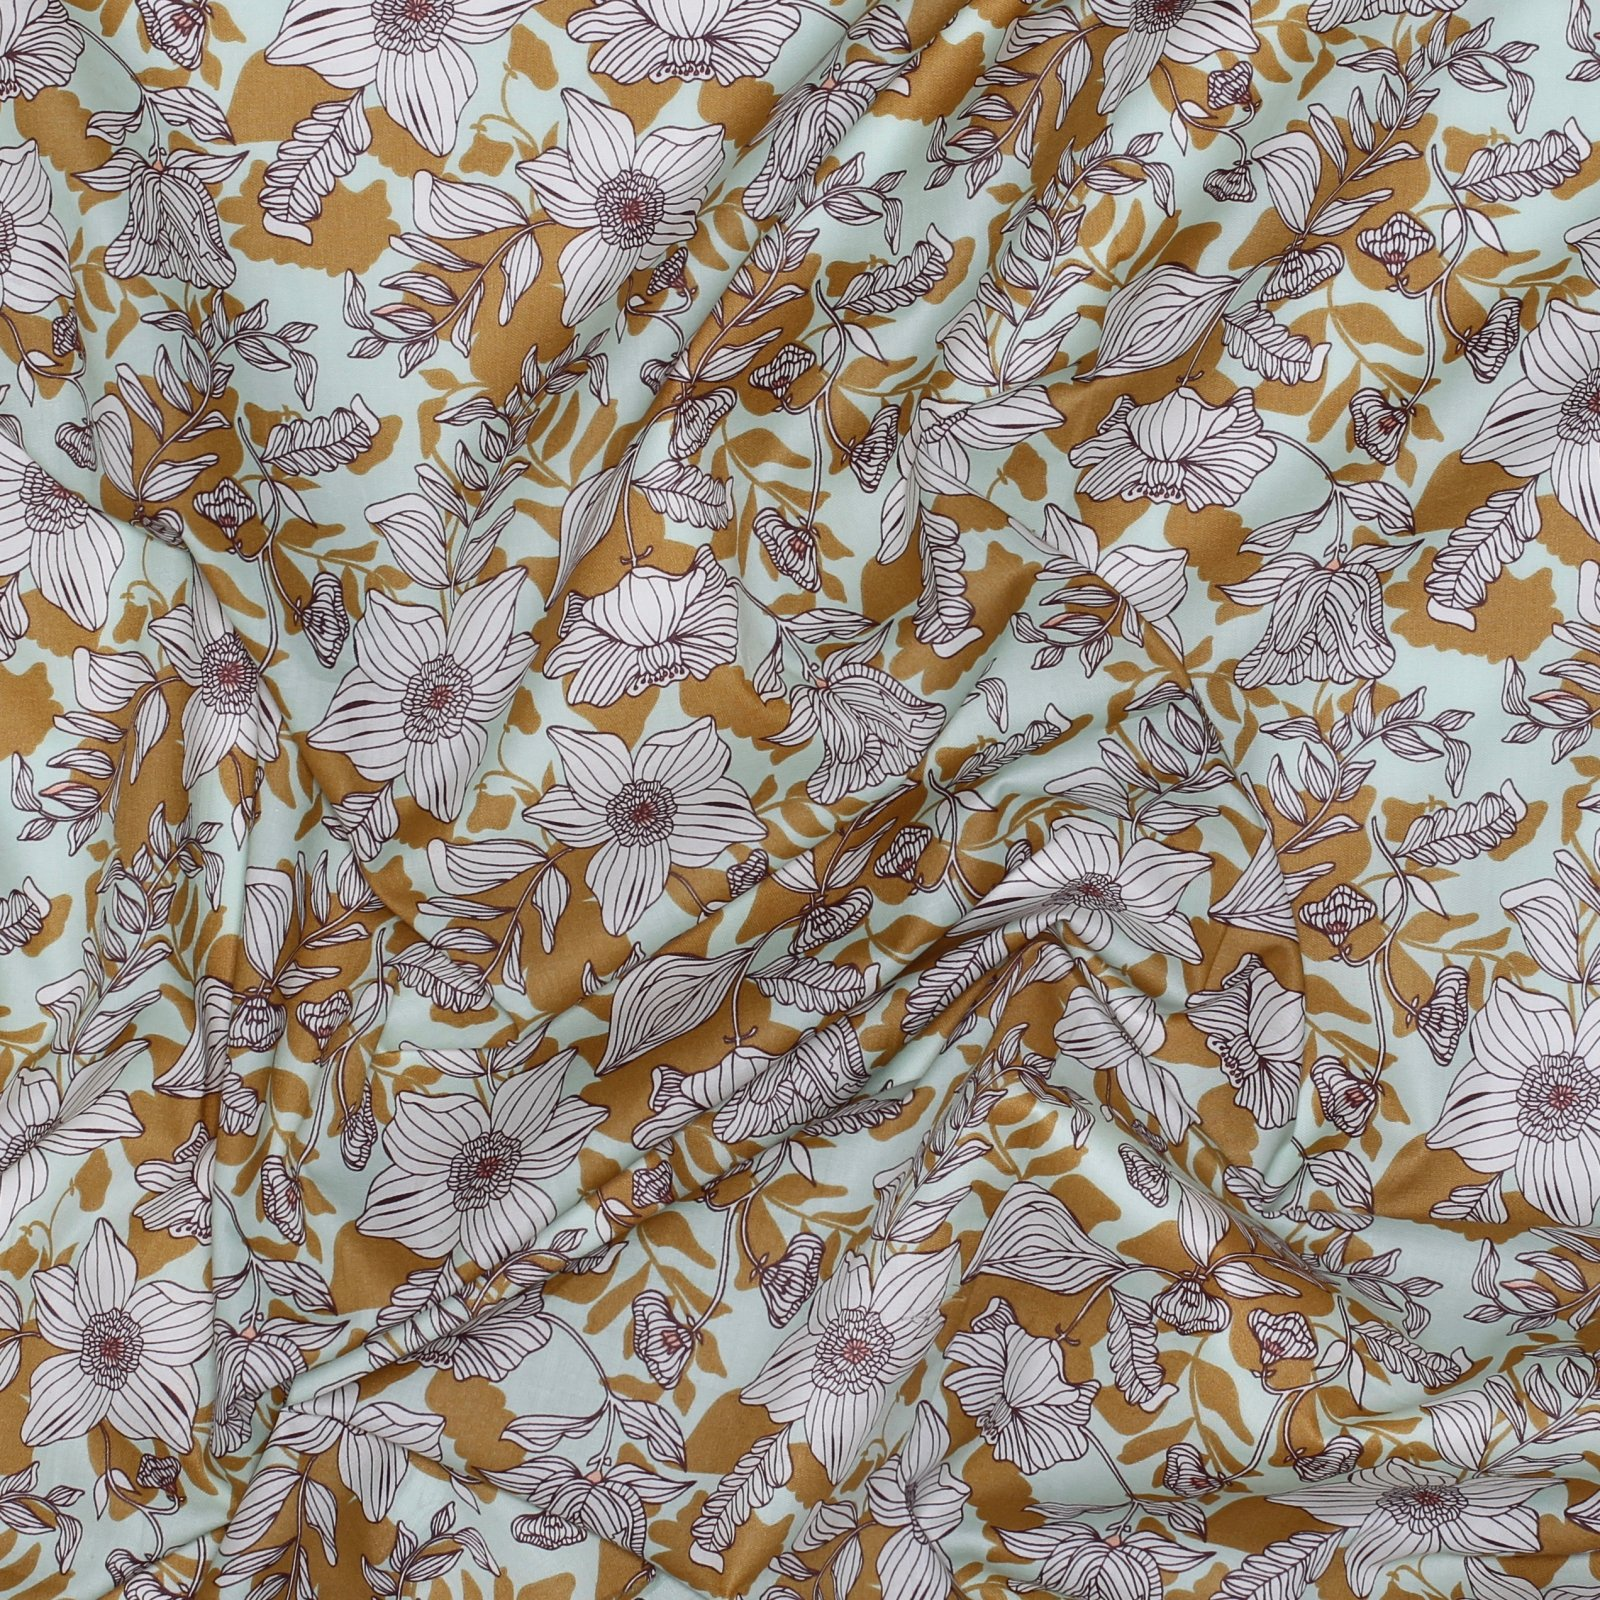 Thrive Passiflora - Art Gallery Cotton Voile